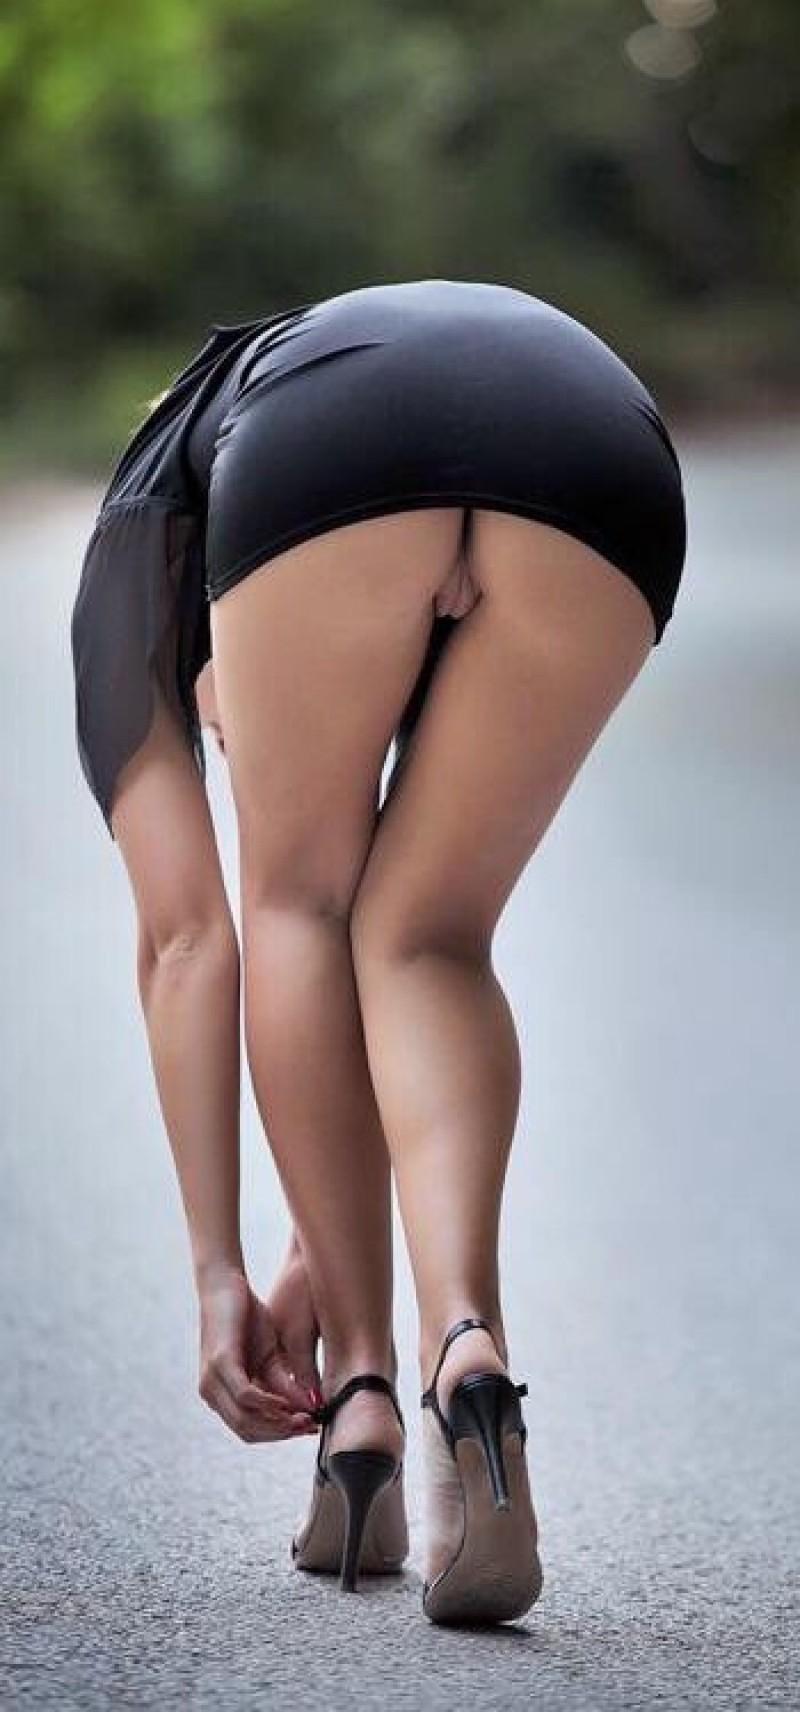 john leslie sasha grey joyful striped stockings jpeg